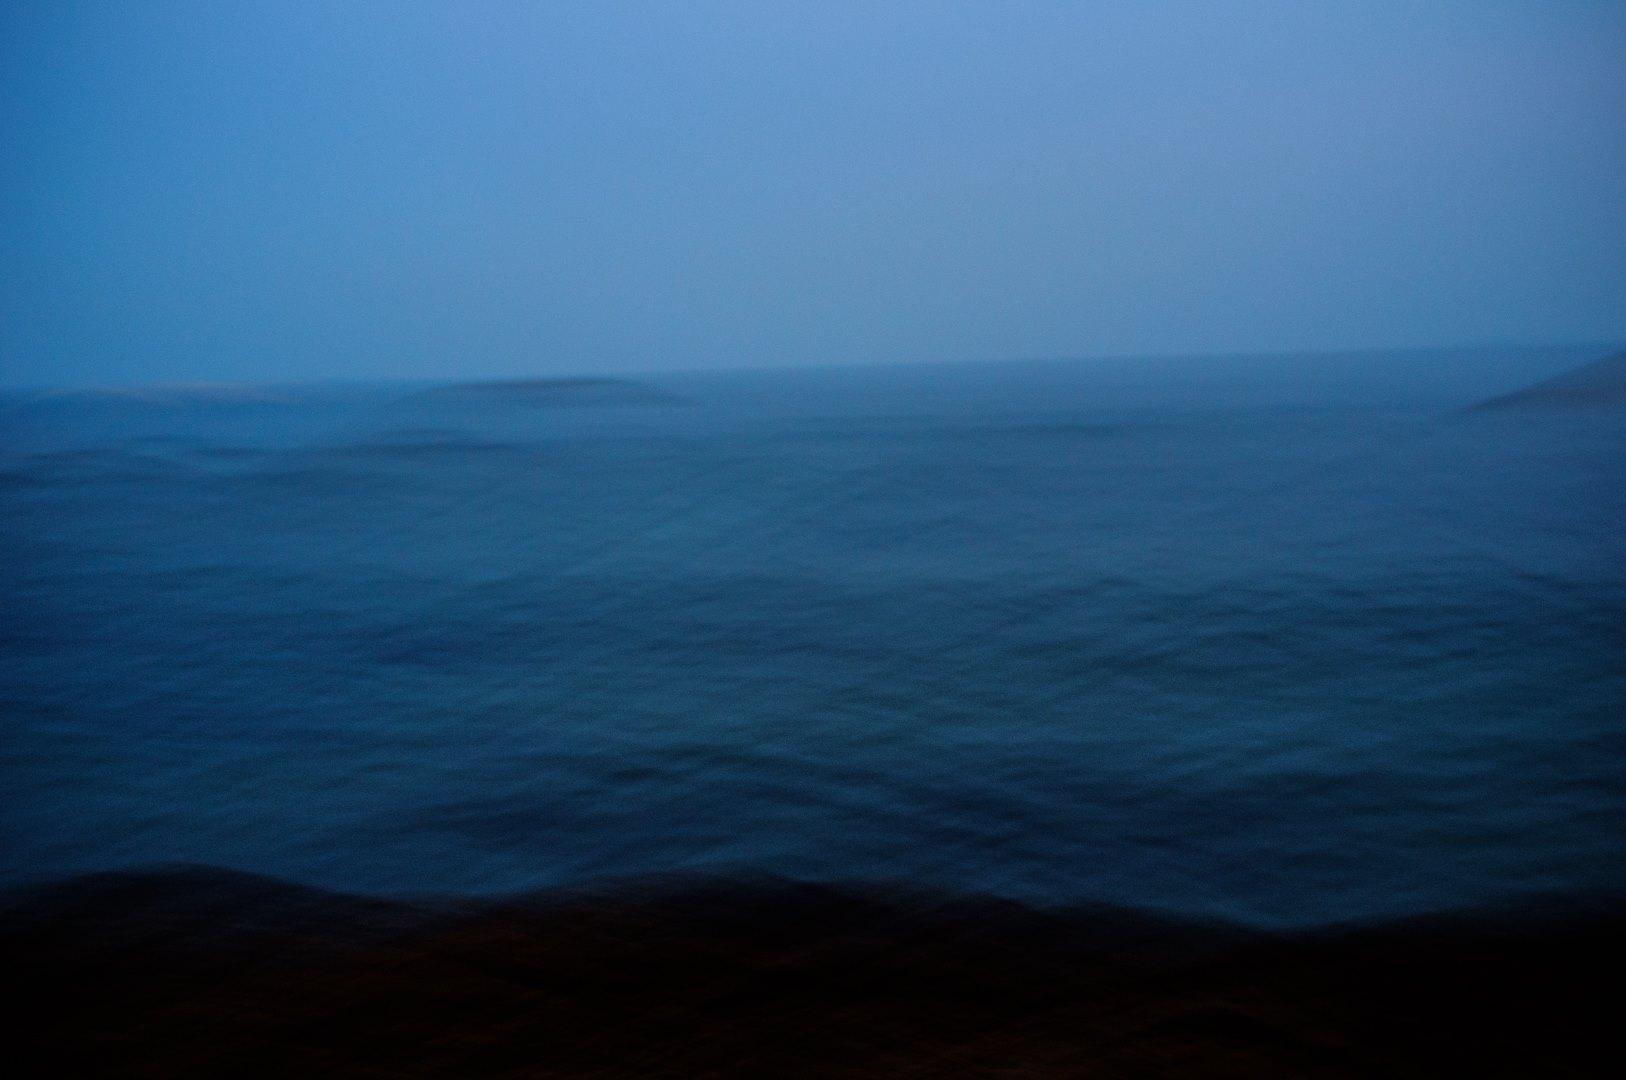 <p>Mallorca. Mediterranean night</p>